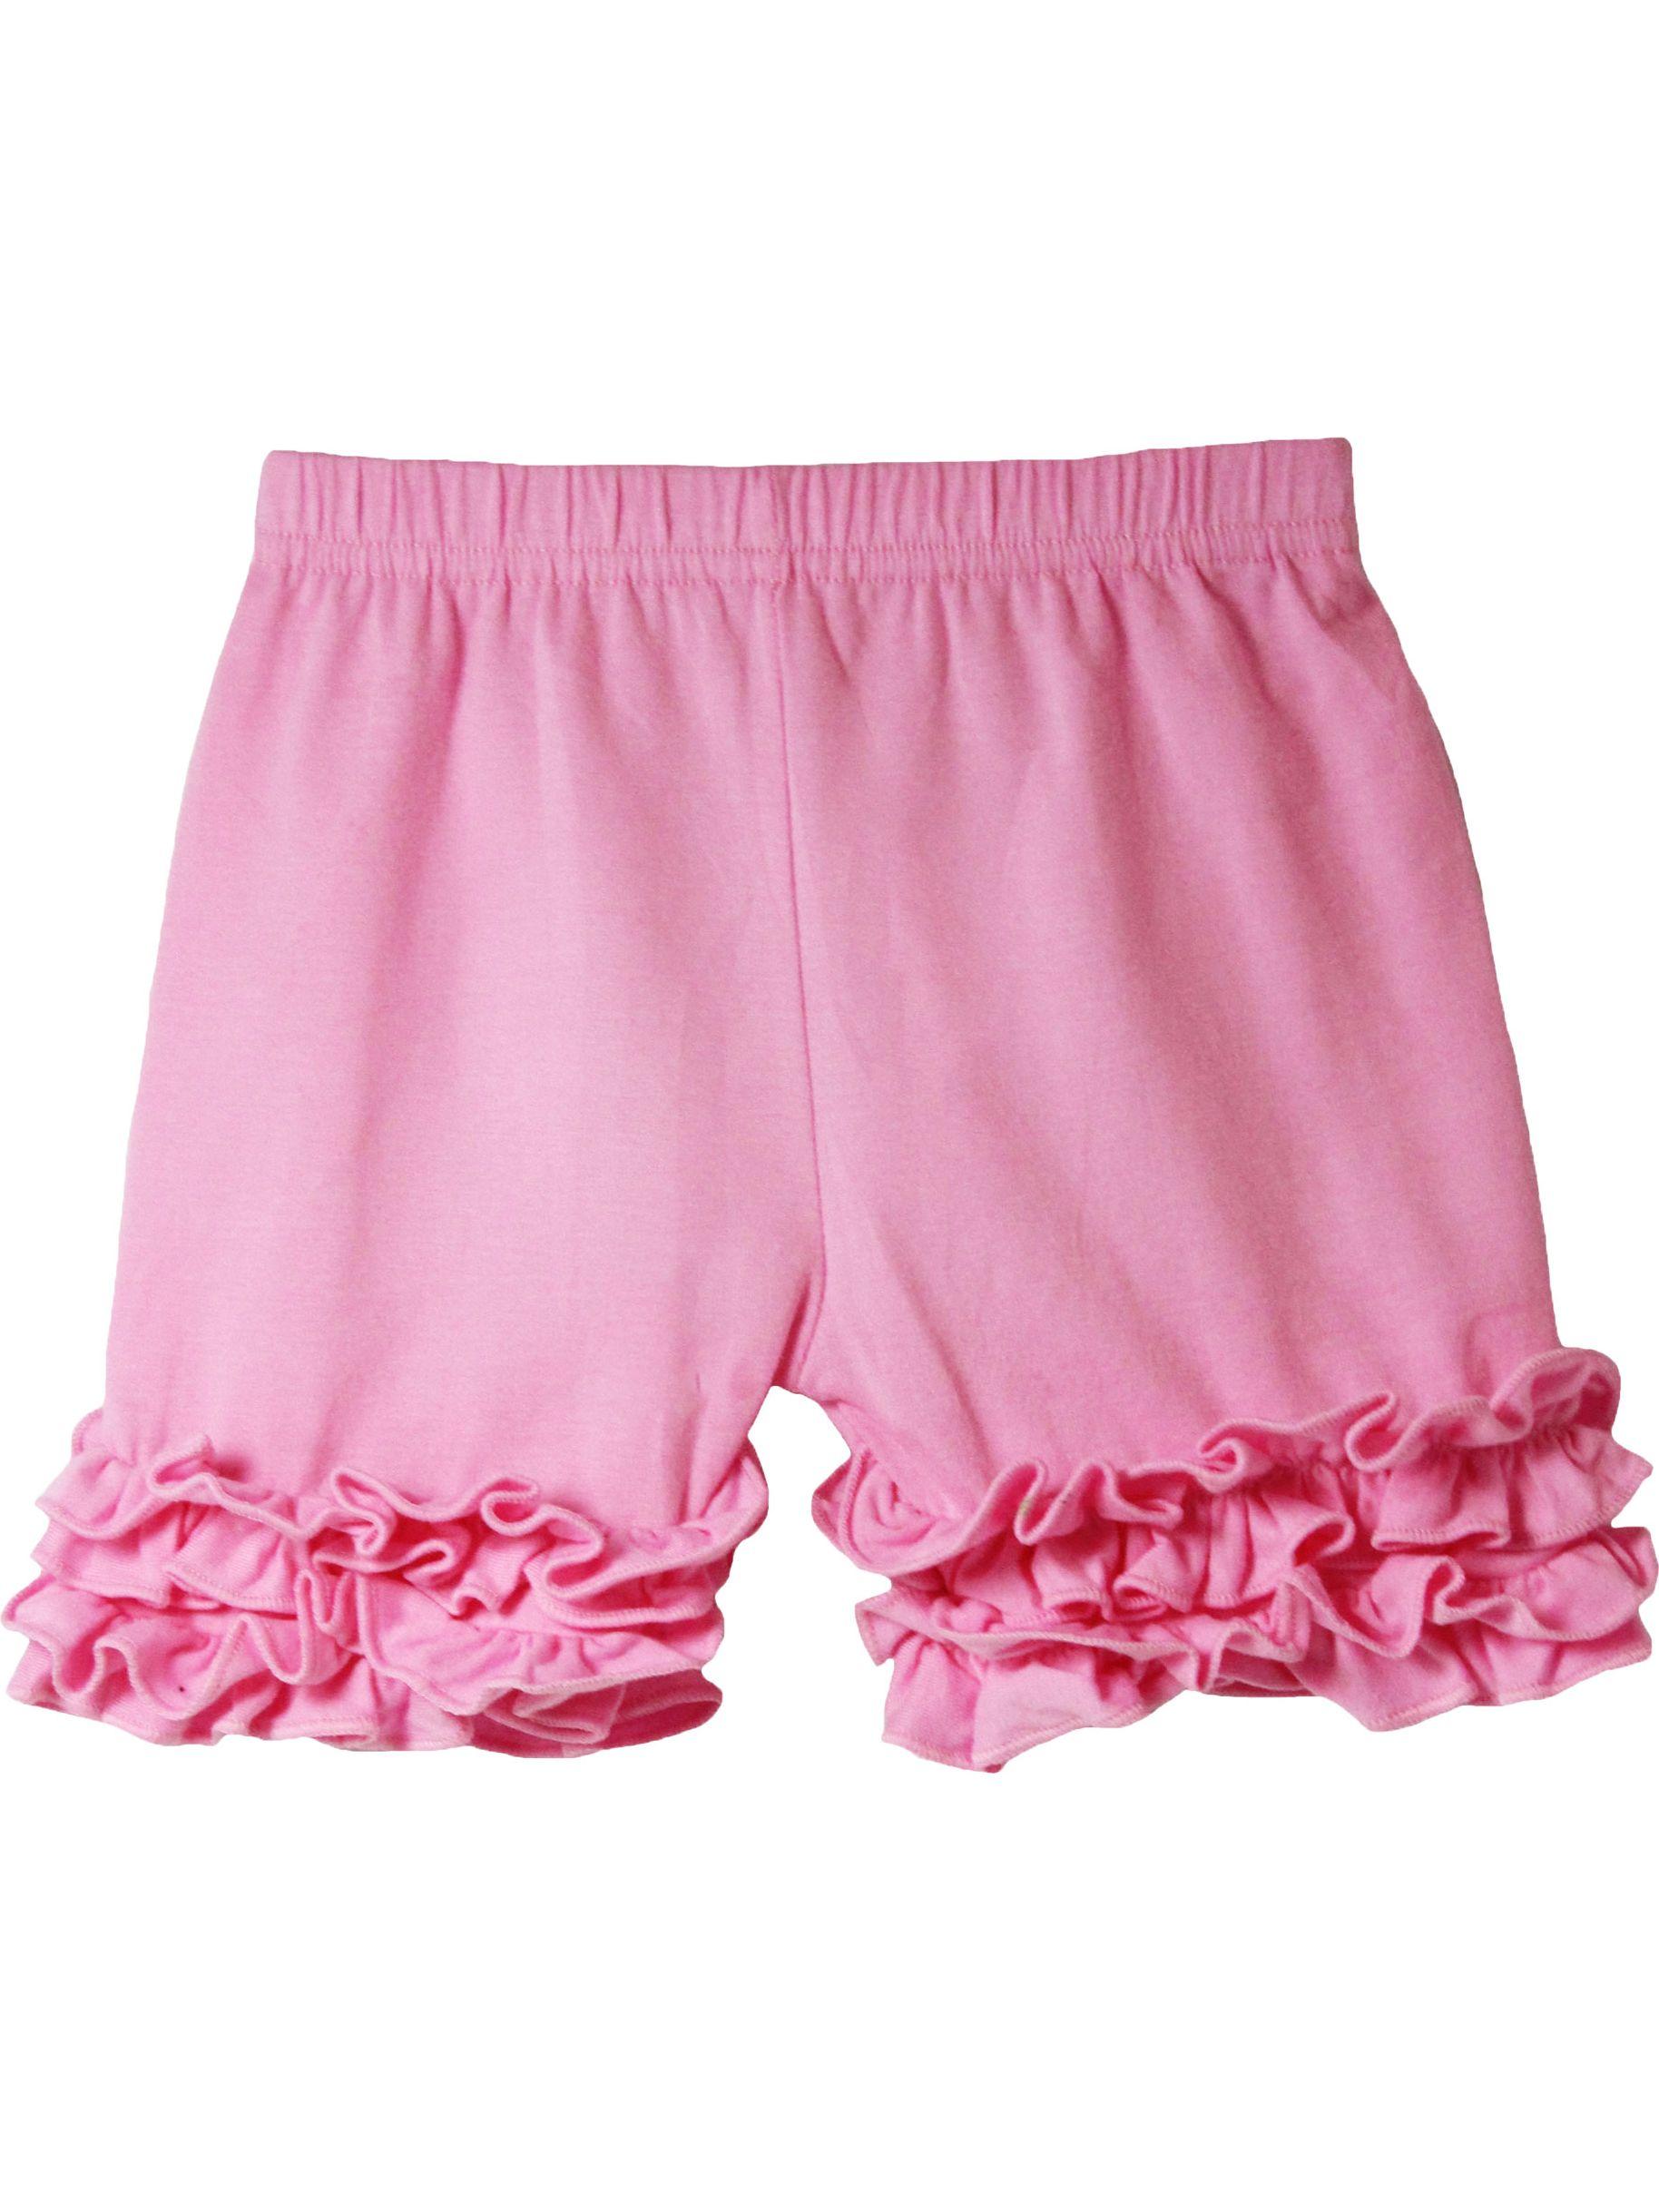 Girls Pink Elastic Waist Ruffle Bottom Icing Boutique Shorts